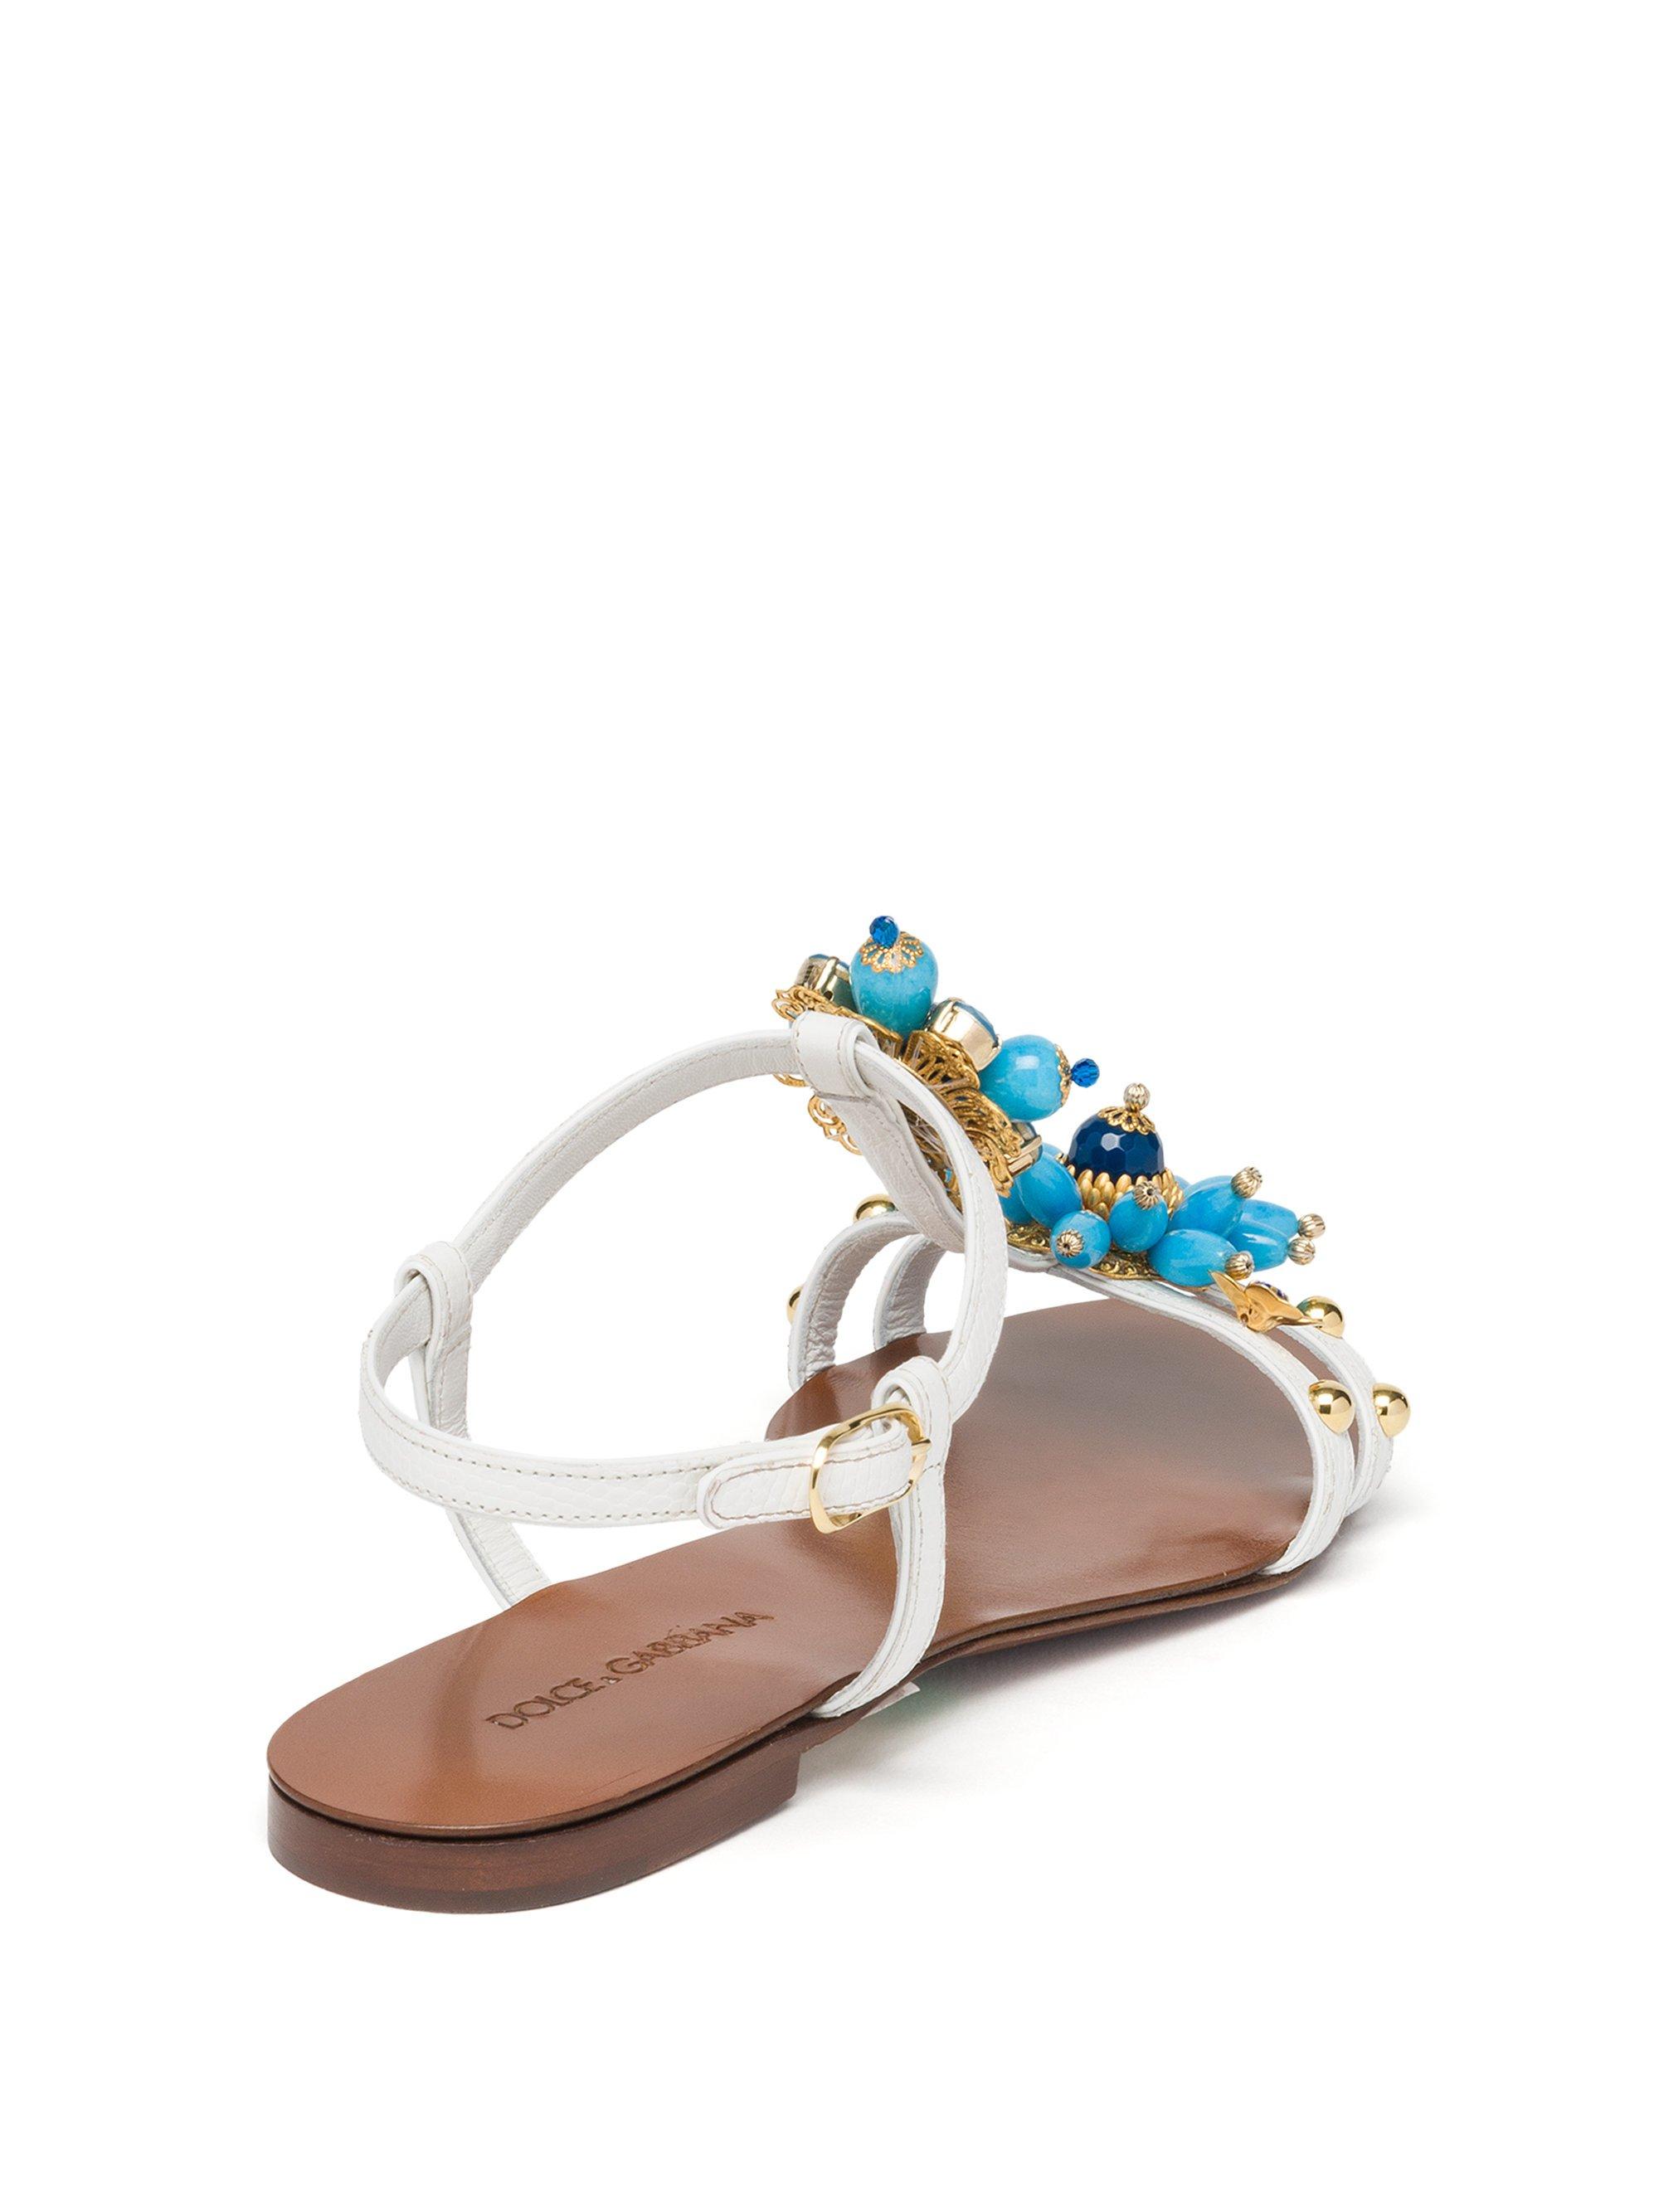 c9e31539ad3e5 Lyst - Dolce   Gabbana Jeweled Leather Flat Sandals in Blue